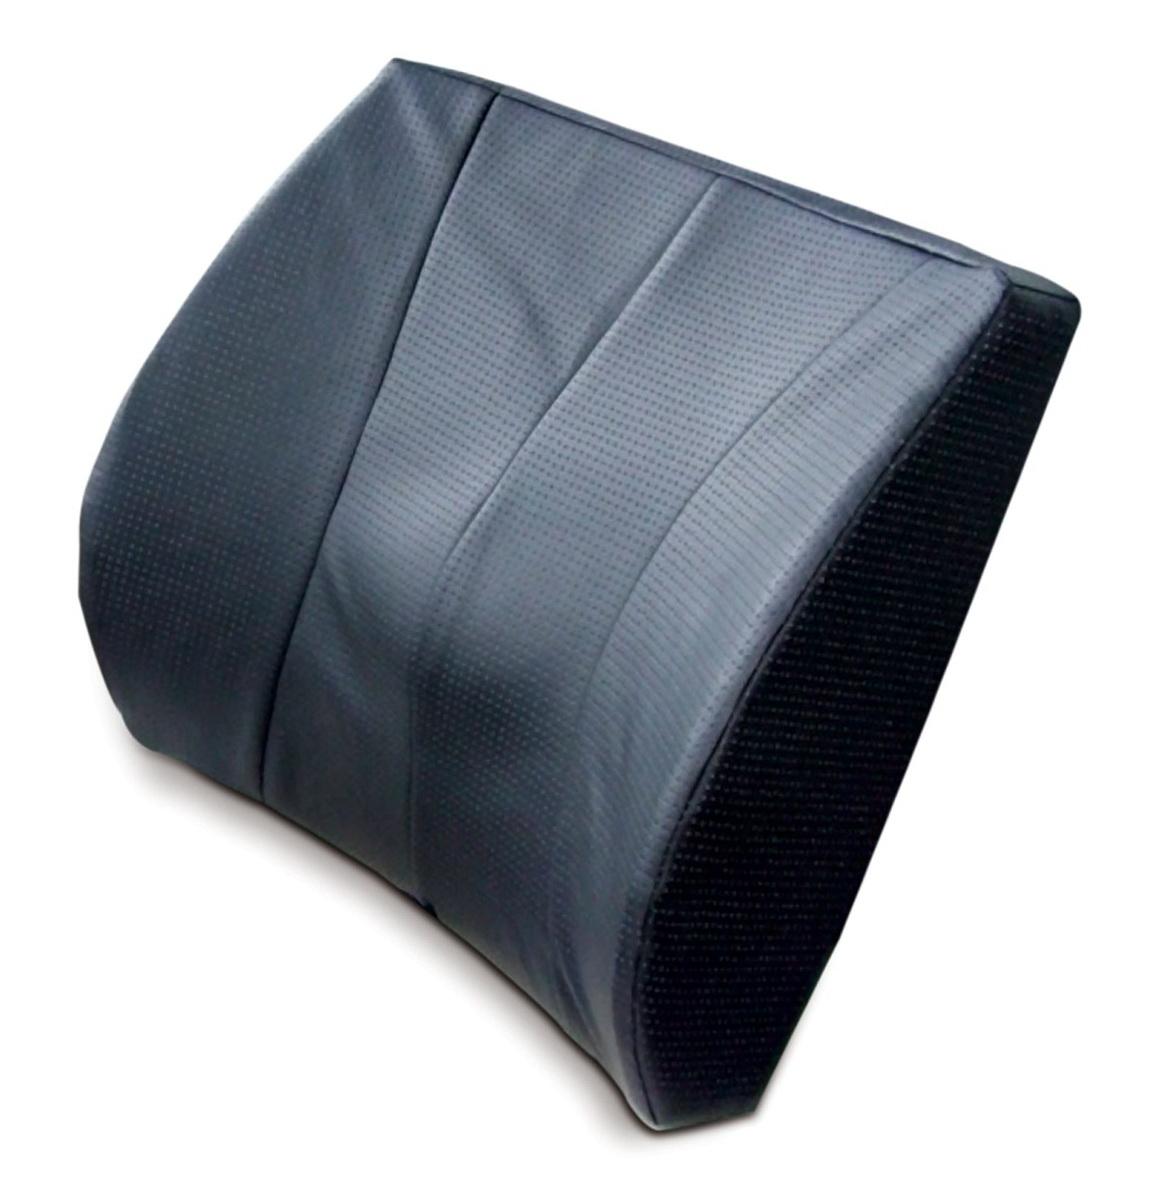 Tempur Pedic Seat Cushion Amazon